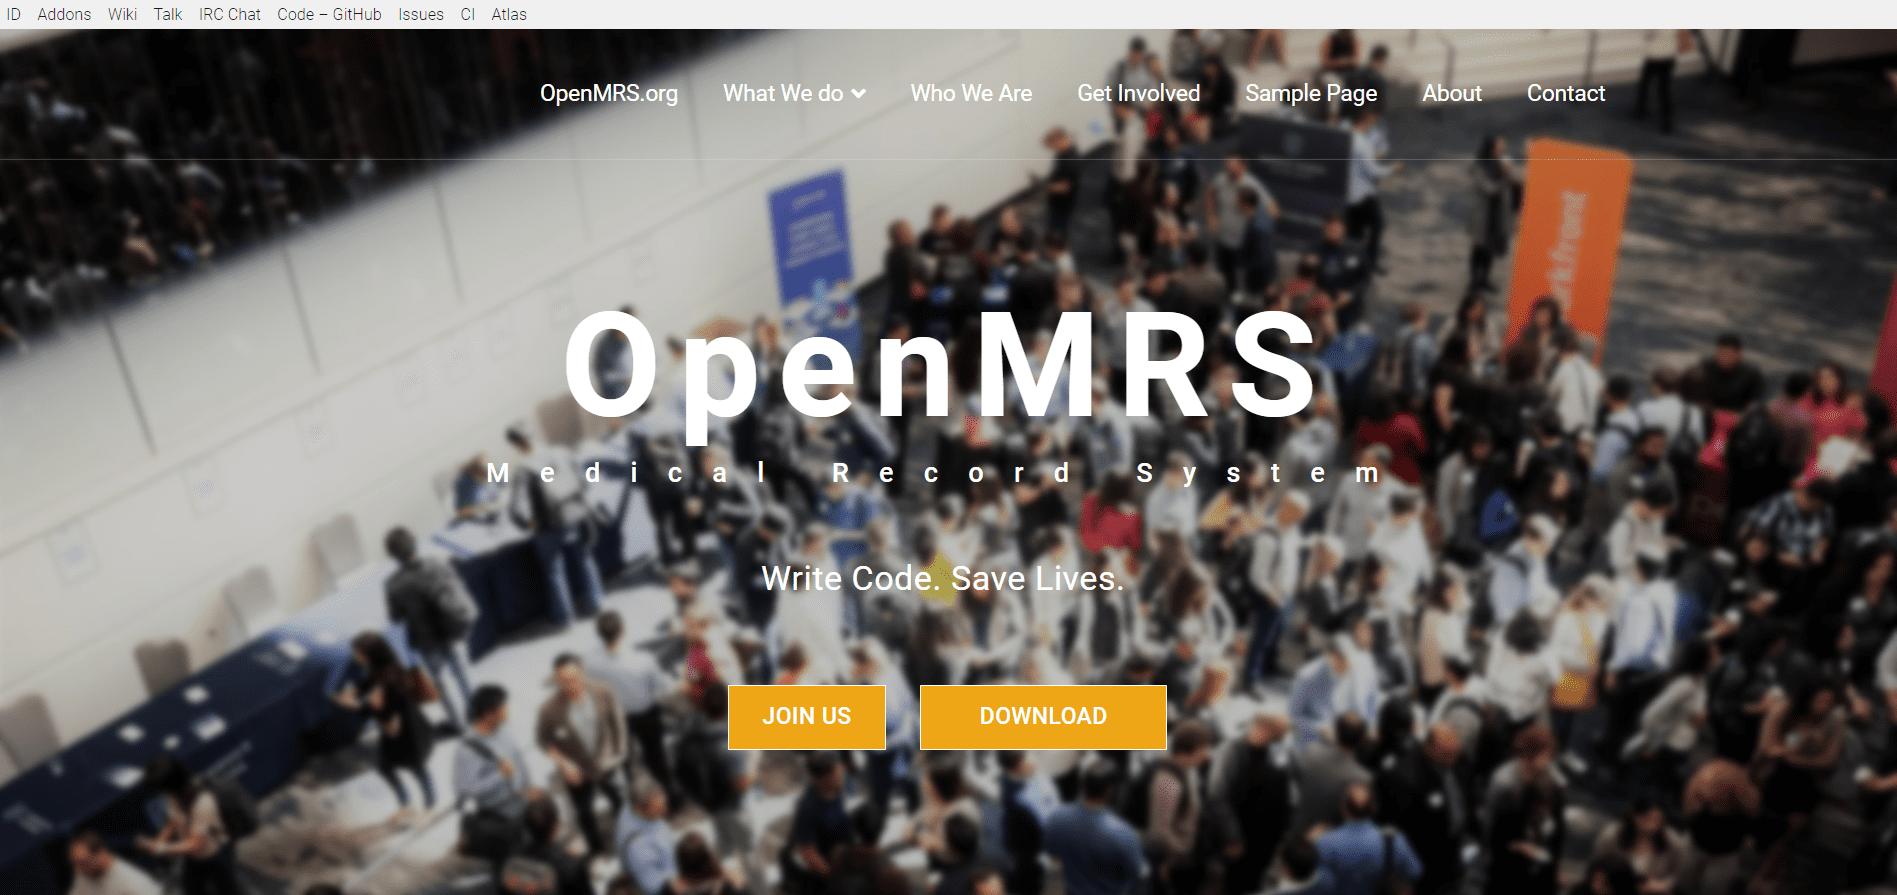 openmrs website, new design, open-source project